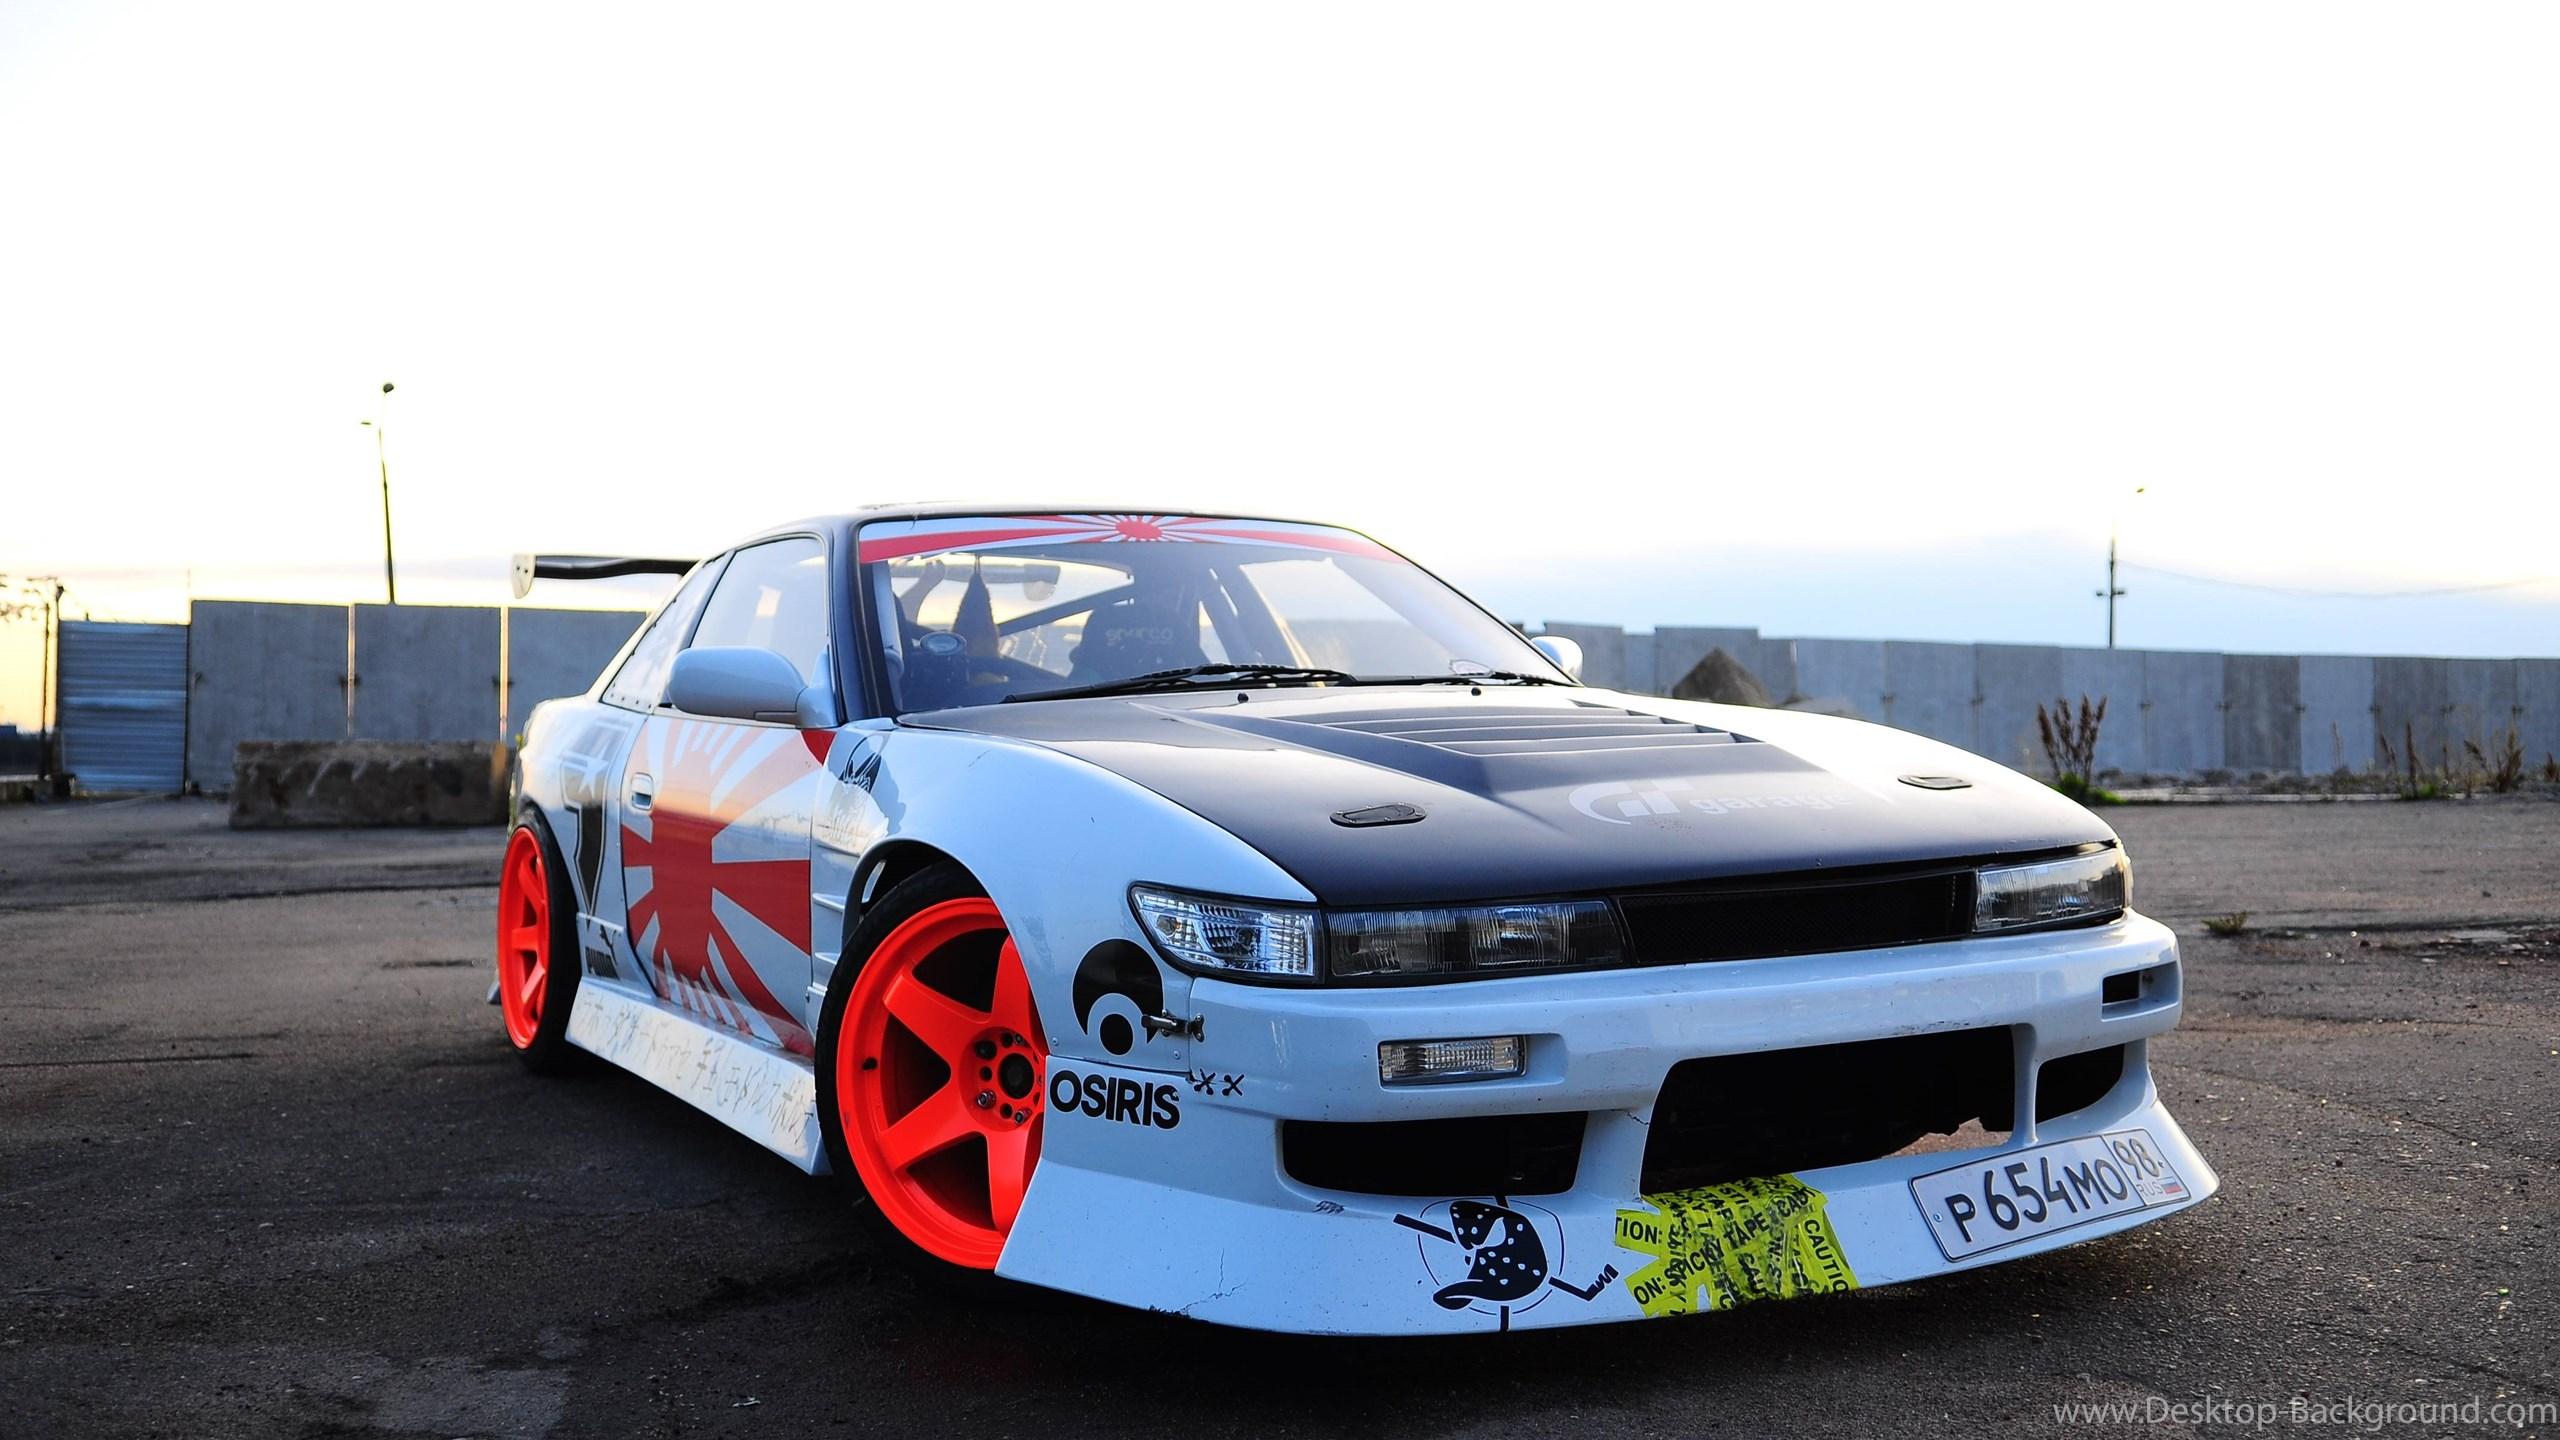 Popular Nissan Silvia S13 1757833 Hd Wallpaper Backgrounds Download